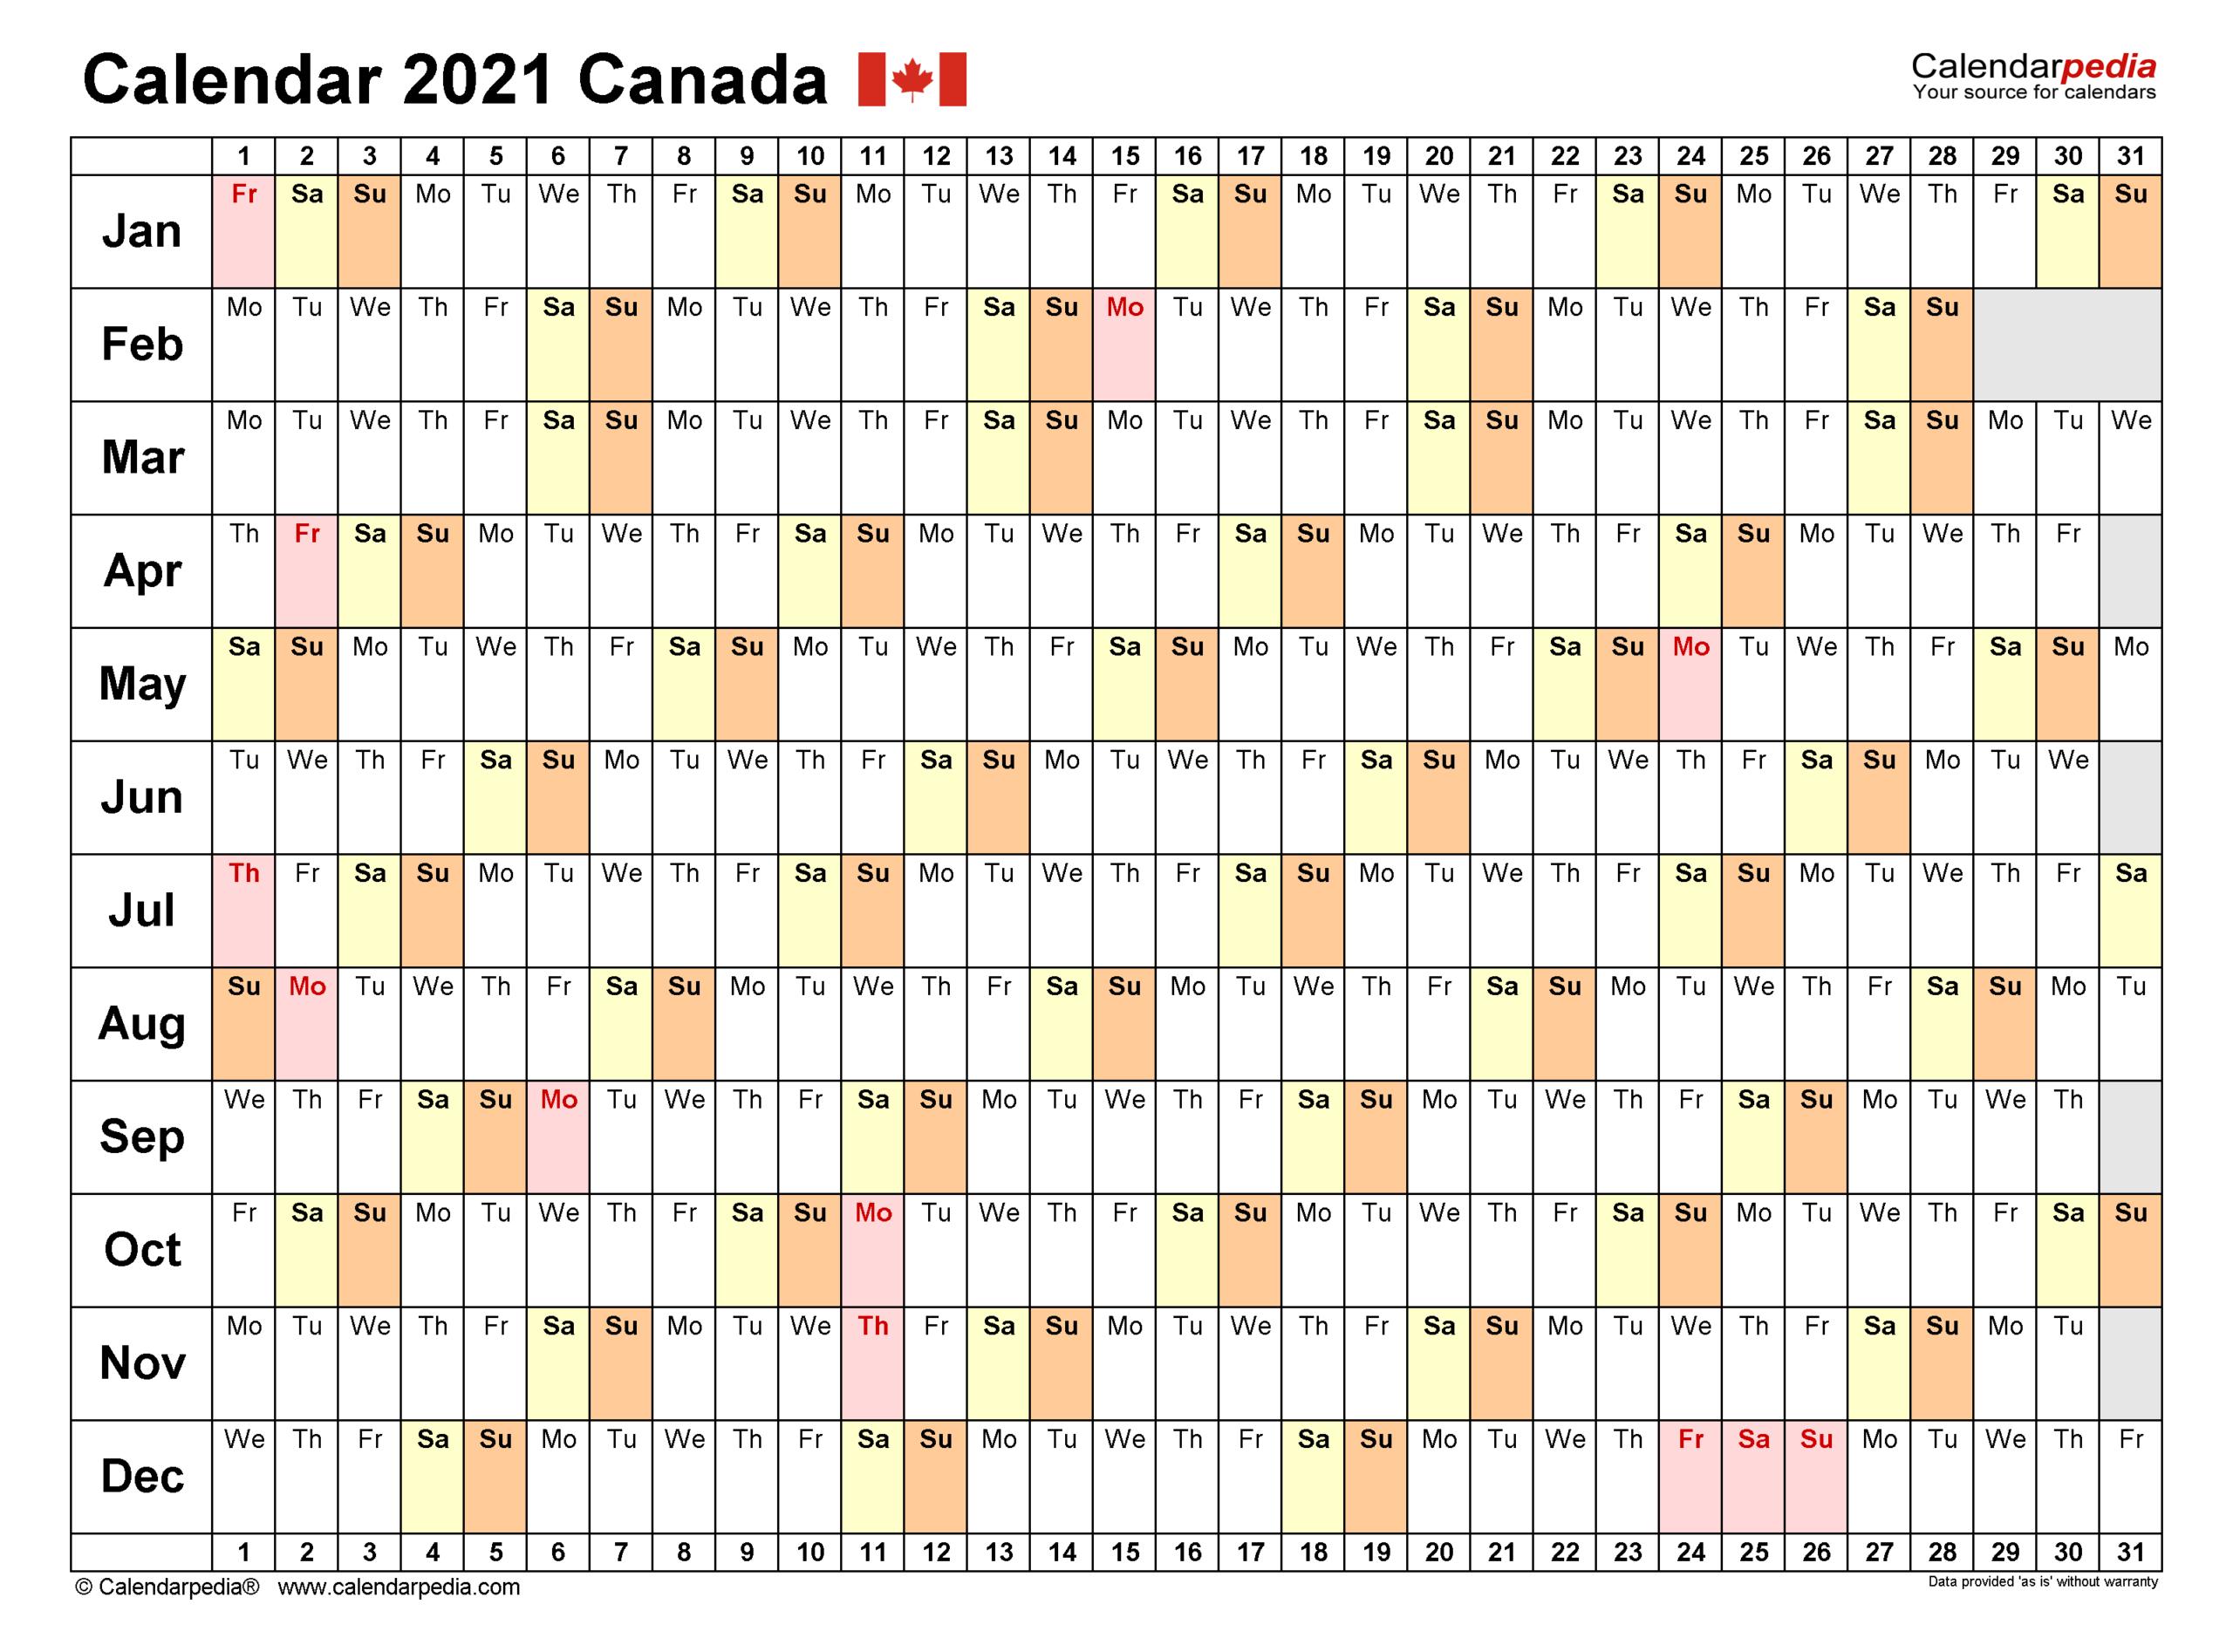 Canada Calendar 2021 - Free Printable Excel Templates